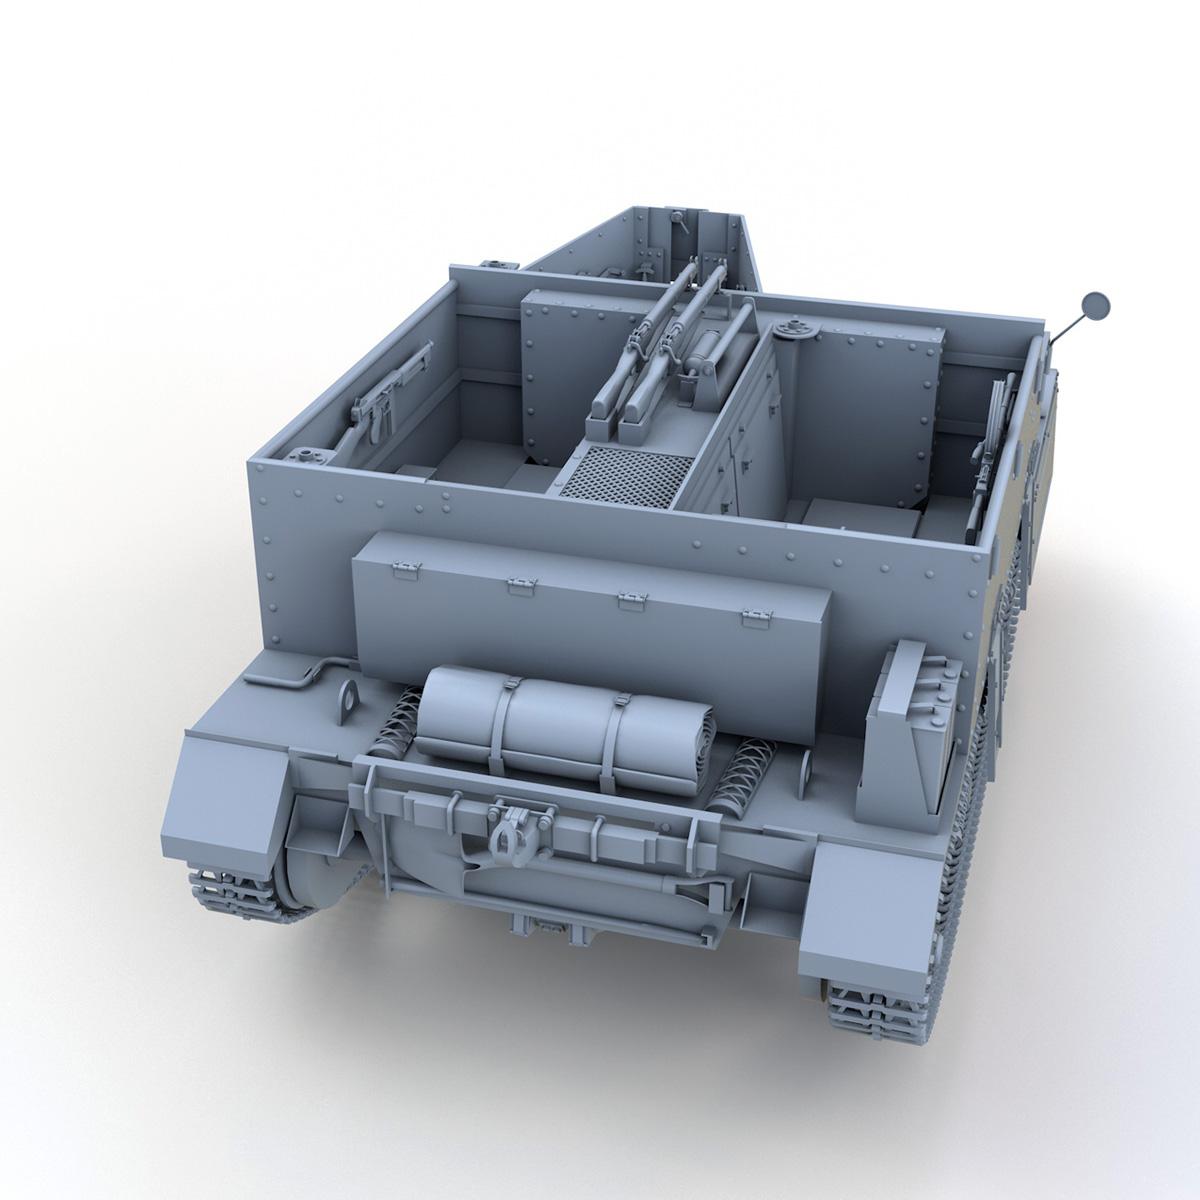 Universal Carrier MK II - Bren Gun Carrier 3d model 3ds fbx c4d lwo lws lw obj 272961